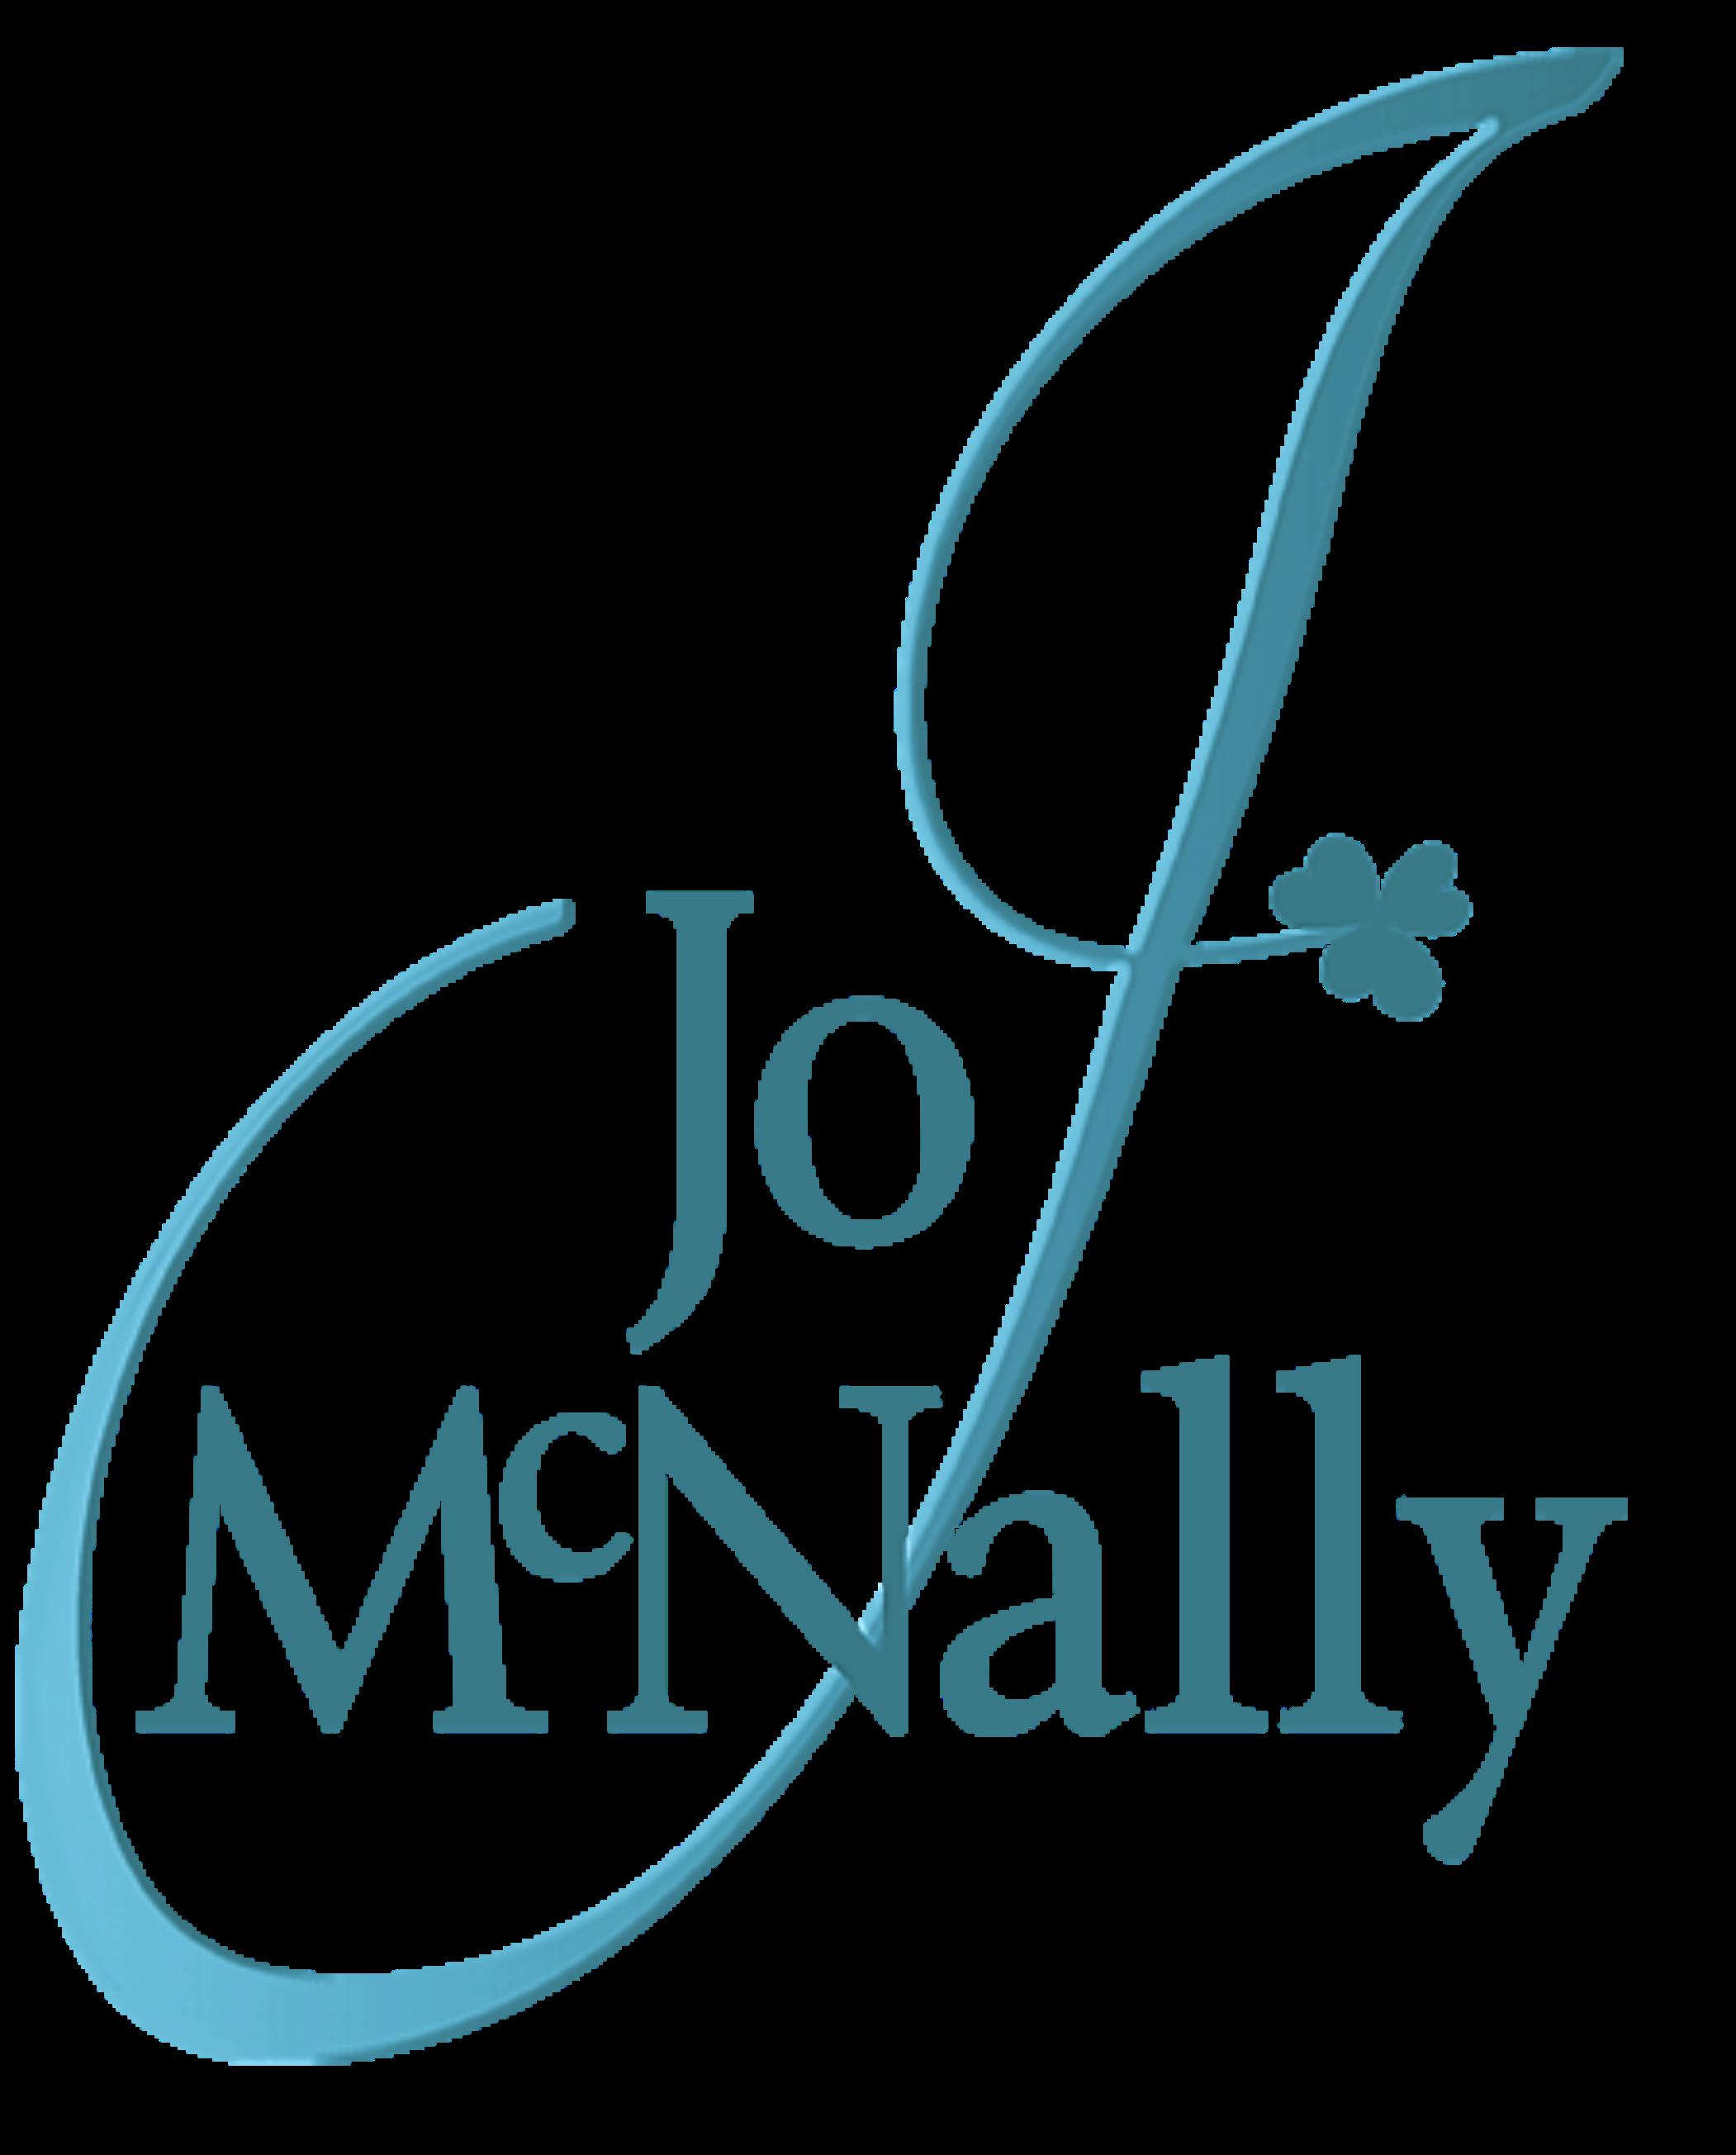 https://jomcnallyromance.com/wp-content/uploads/2020/12/cropped-logo.png